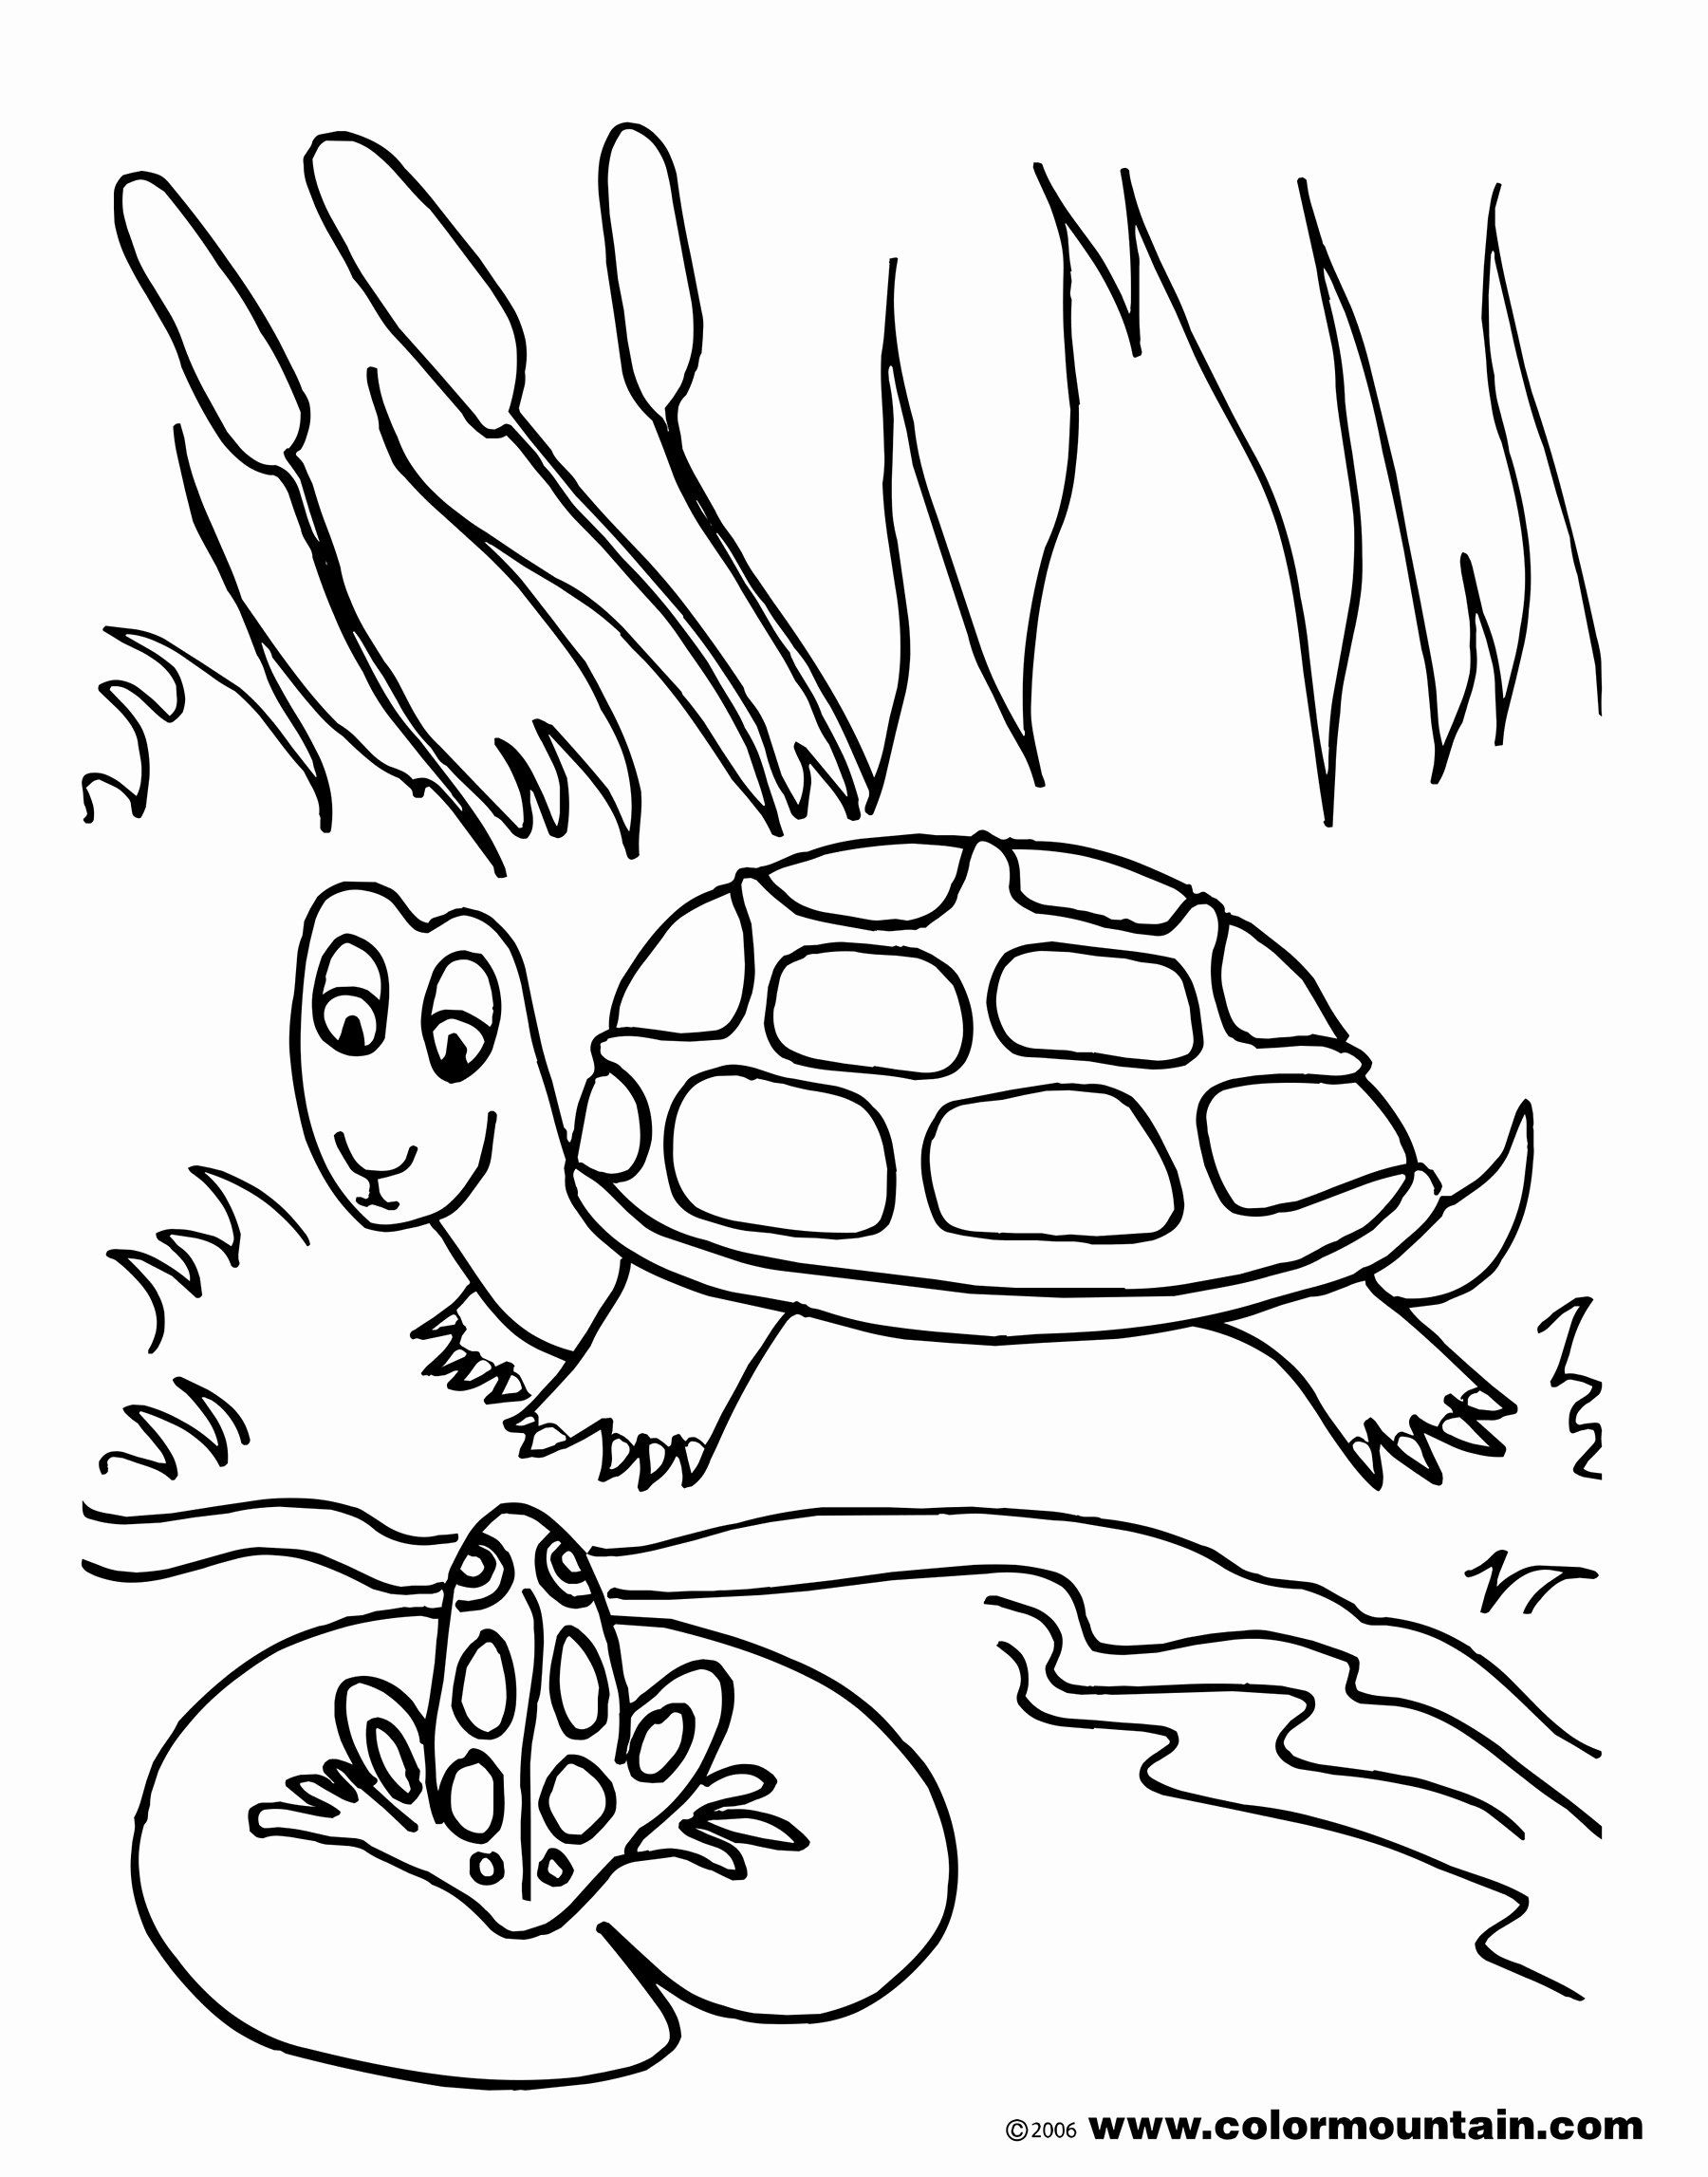 Ocean Habitat Coloring Pages Fresh Sea Turtle Printable Coloring Pages At Getcolorings Turtle Coloring Pages Frog Coloring Pages Fish Coloring Page